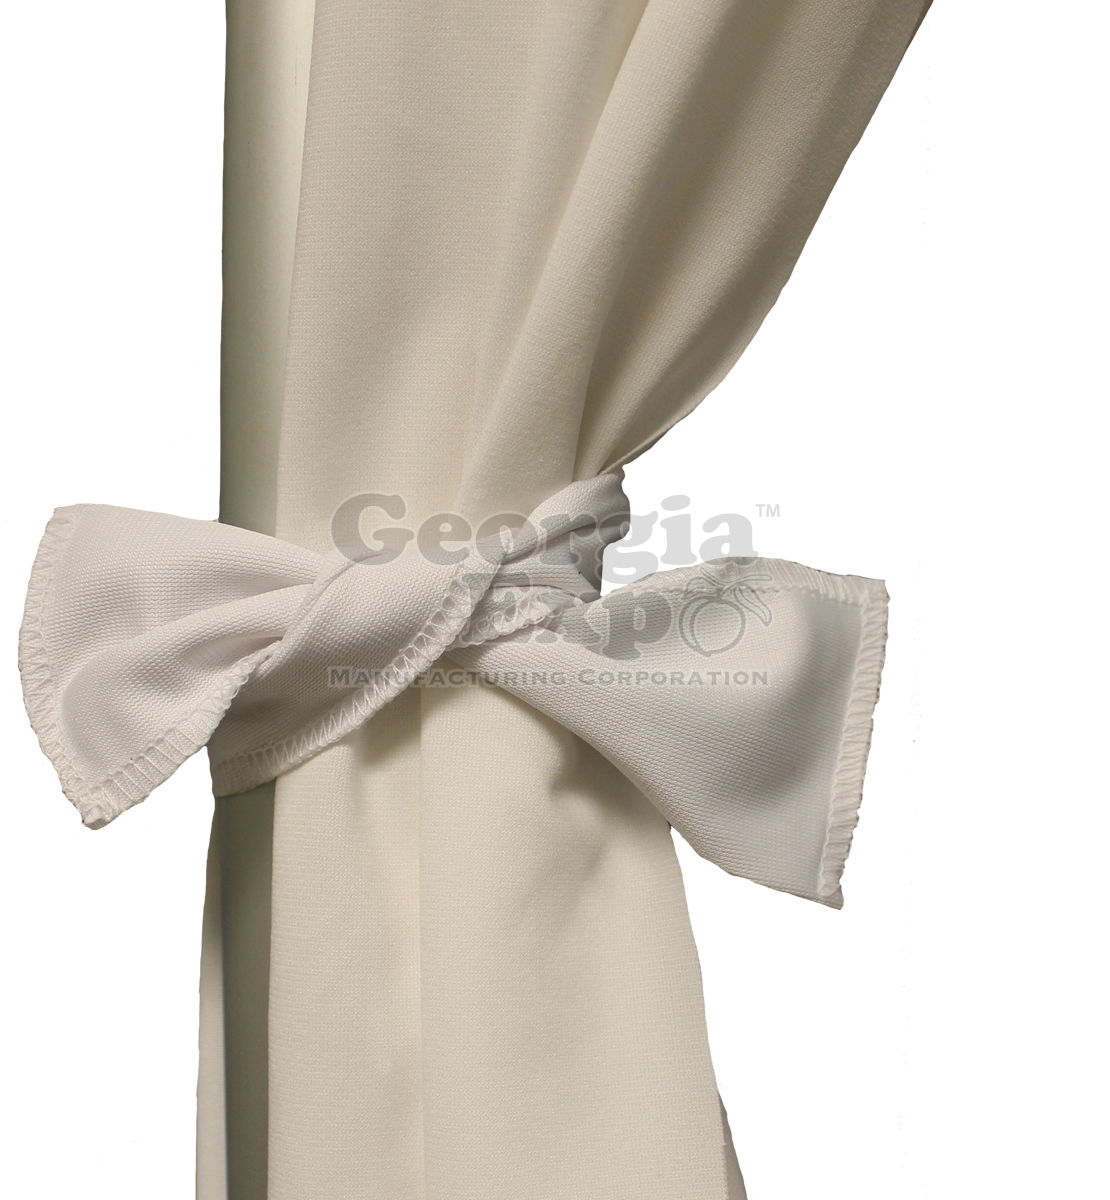 Drapery Tie Backs Georgia Expo